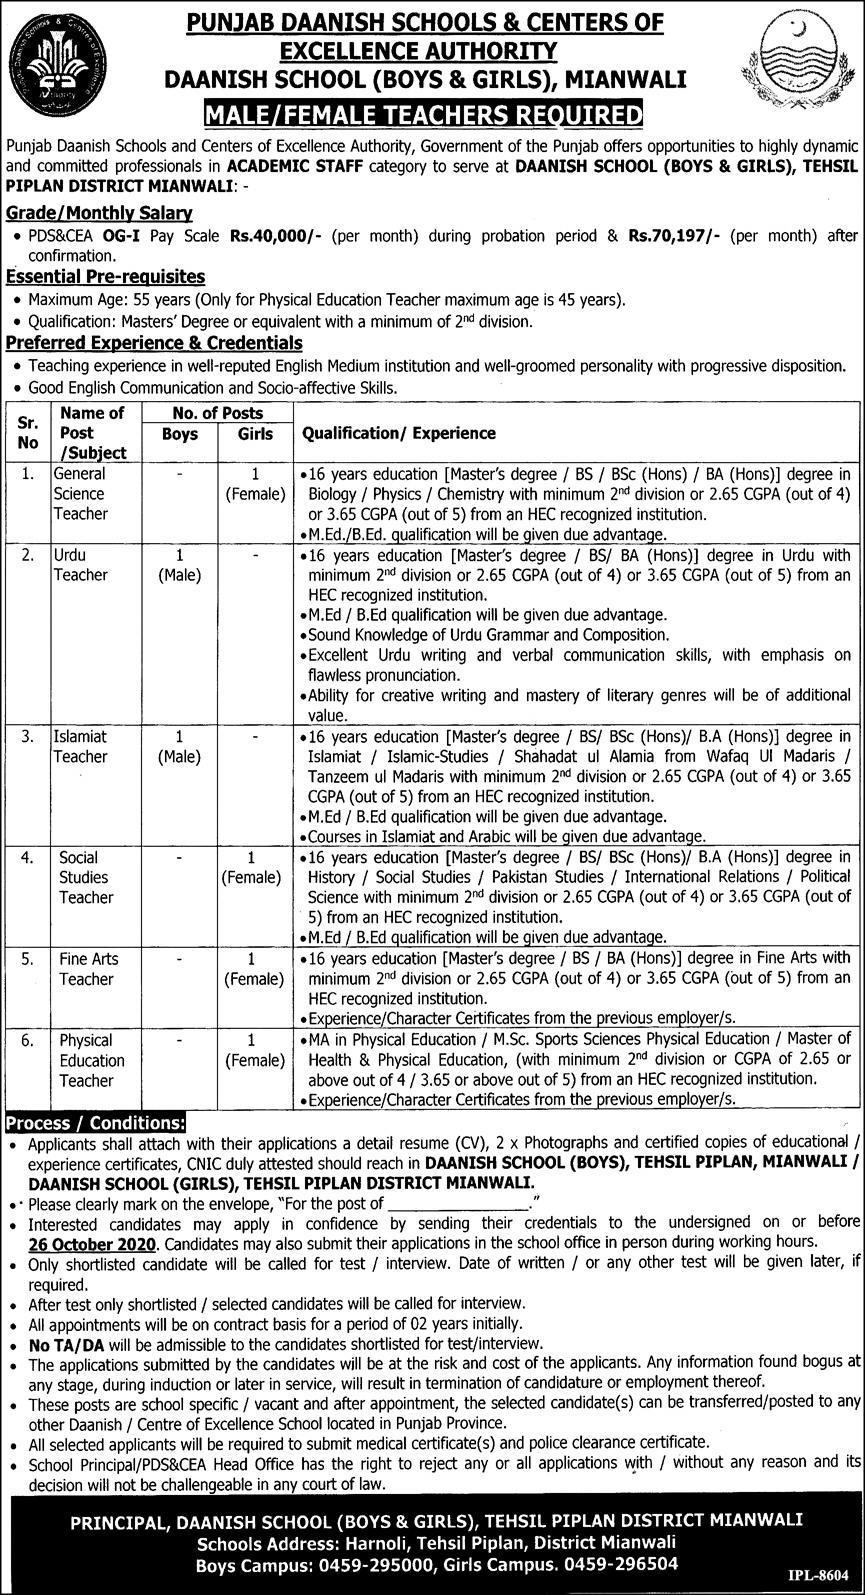 Punjab Daanish School Job Advertisement in Pakistan For Teaching Vacancies